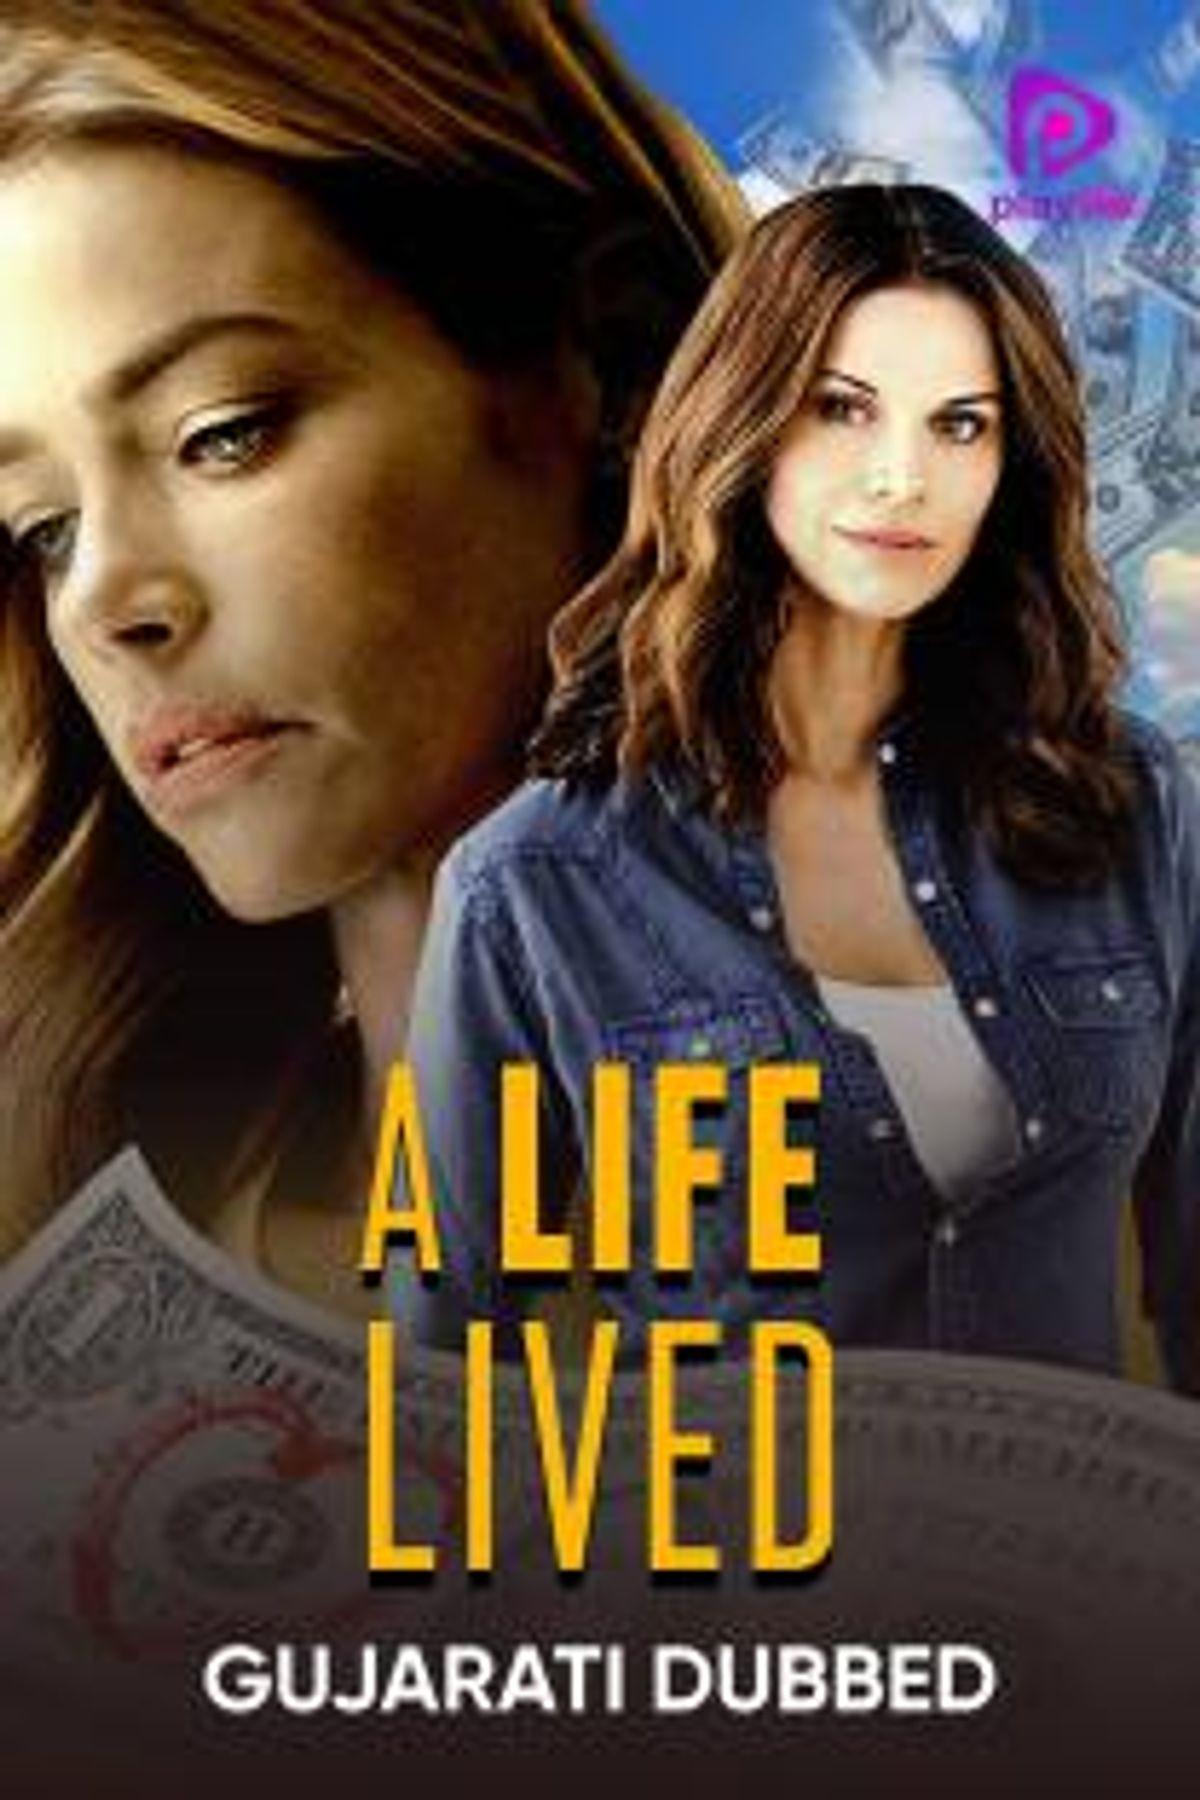 A Life Lived (Gujarati Dubbed)